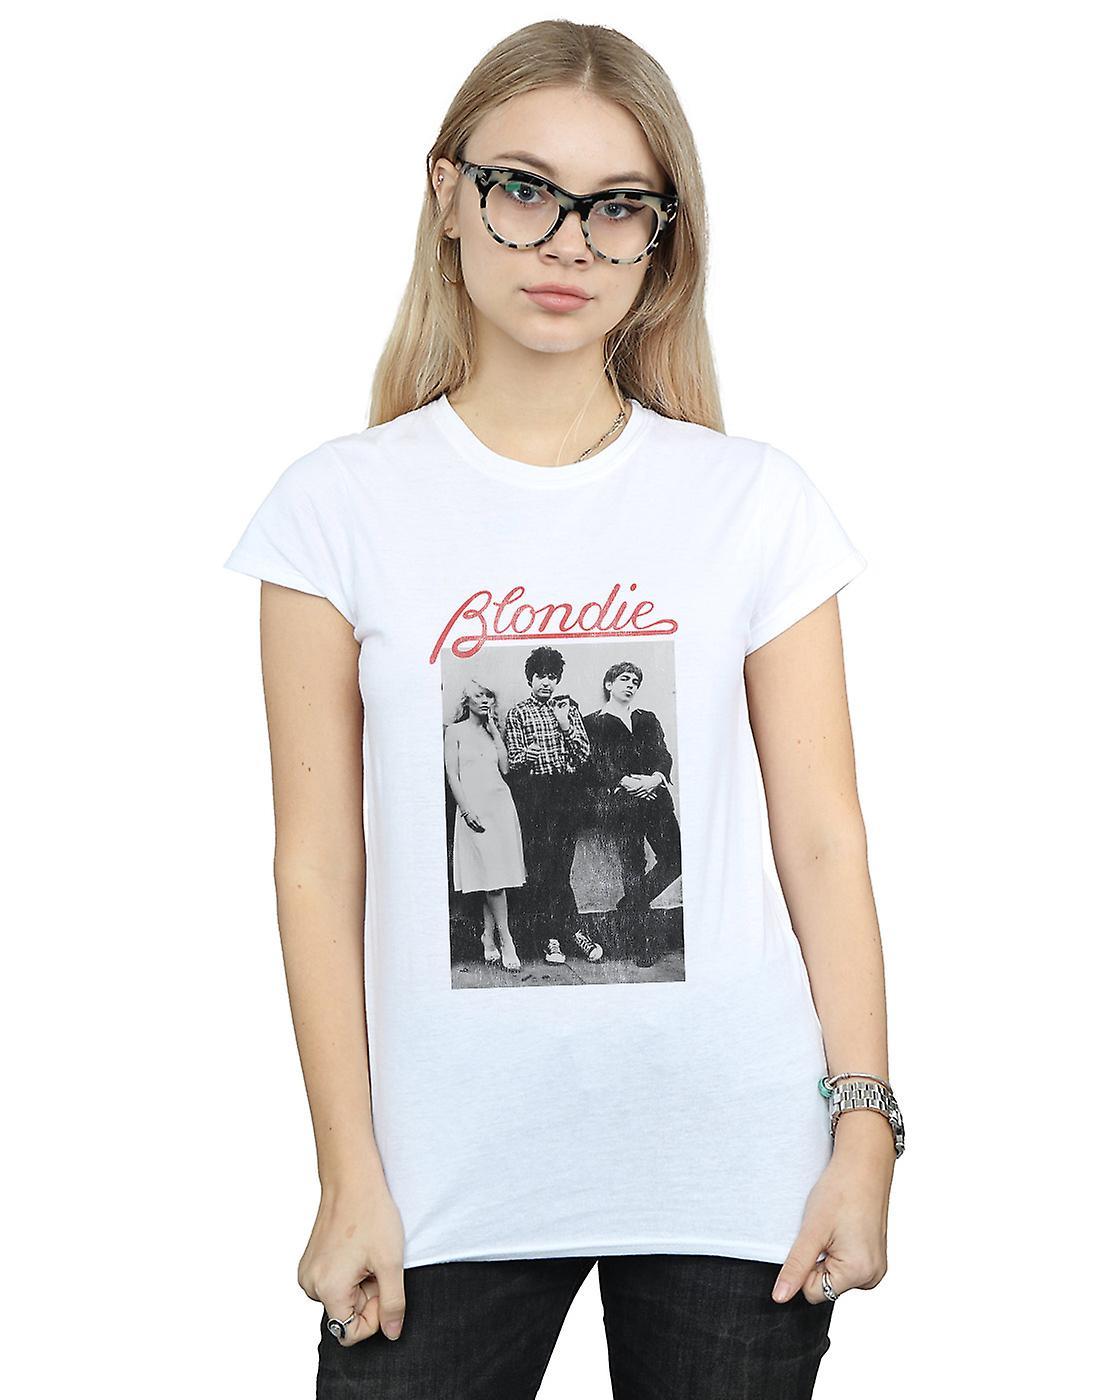 Blondie Women's Distressed Band T-Shirt